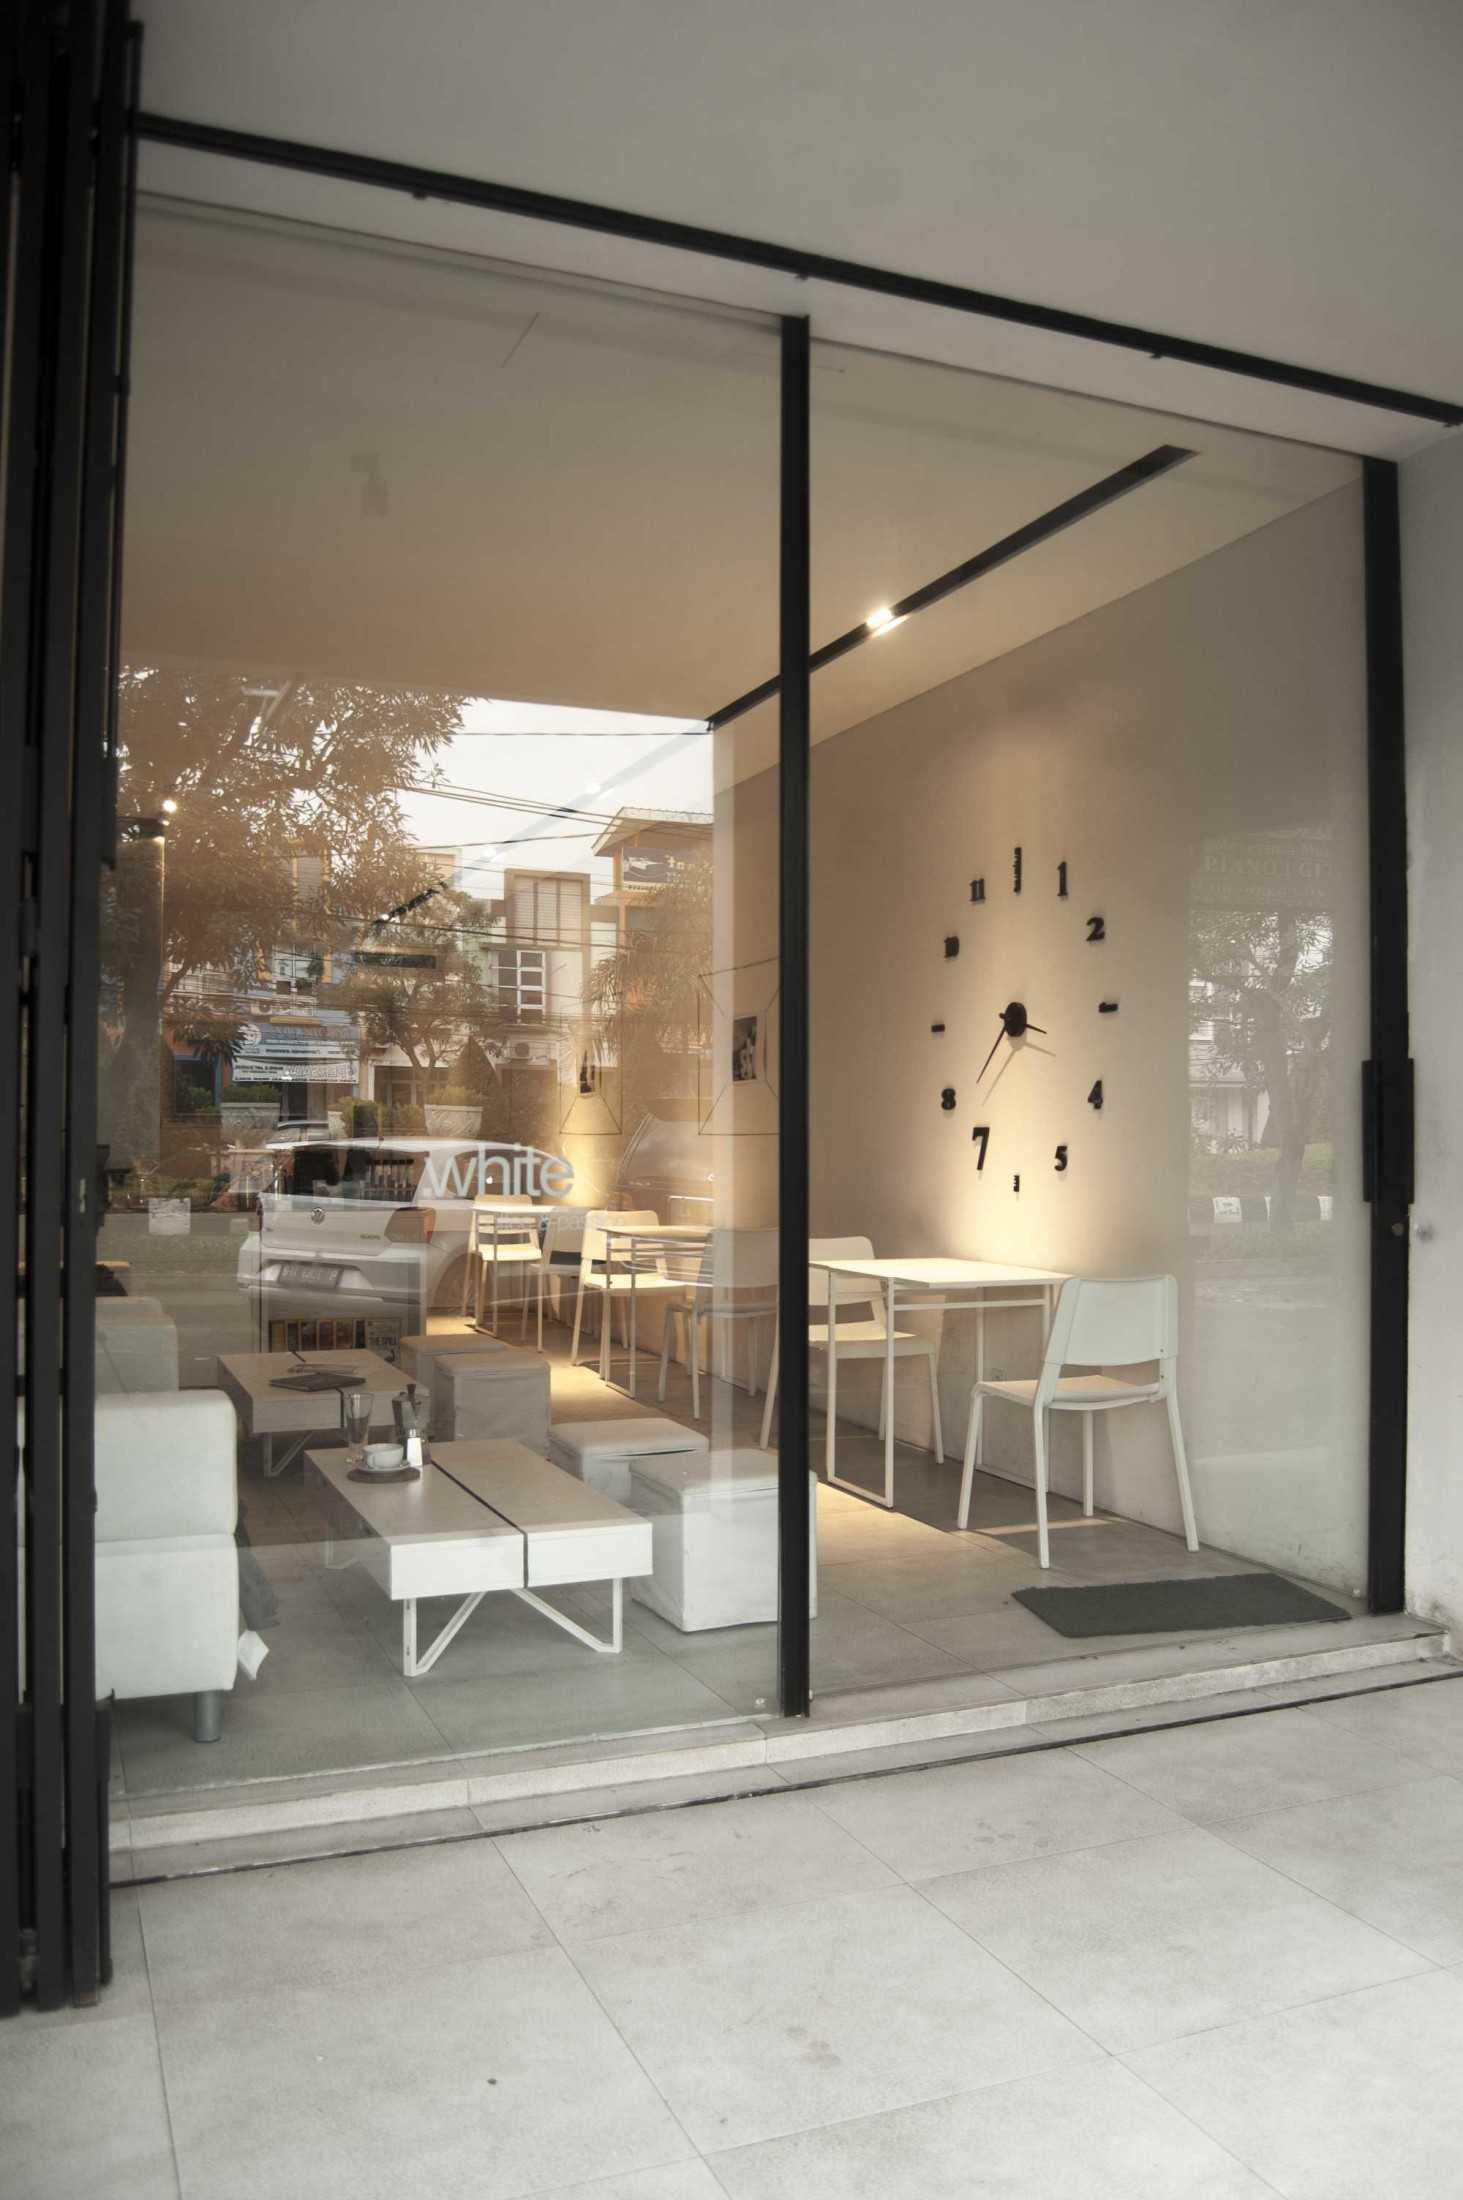 Ads Architect Kafe Kotak Putih Sentul Selatan Sentul Selatan Ads-Architect-Kafe-Kotak-Putih  53515